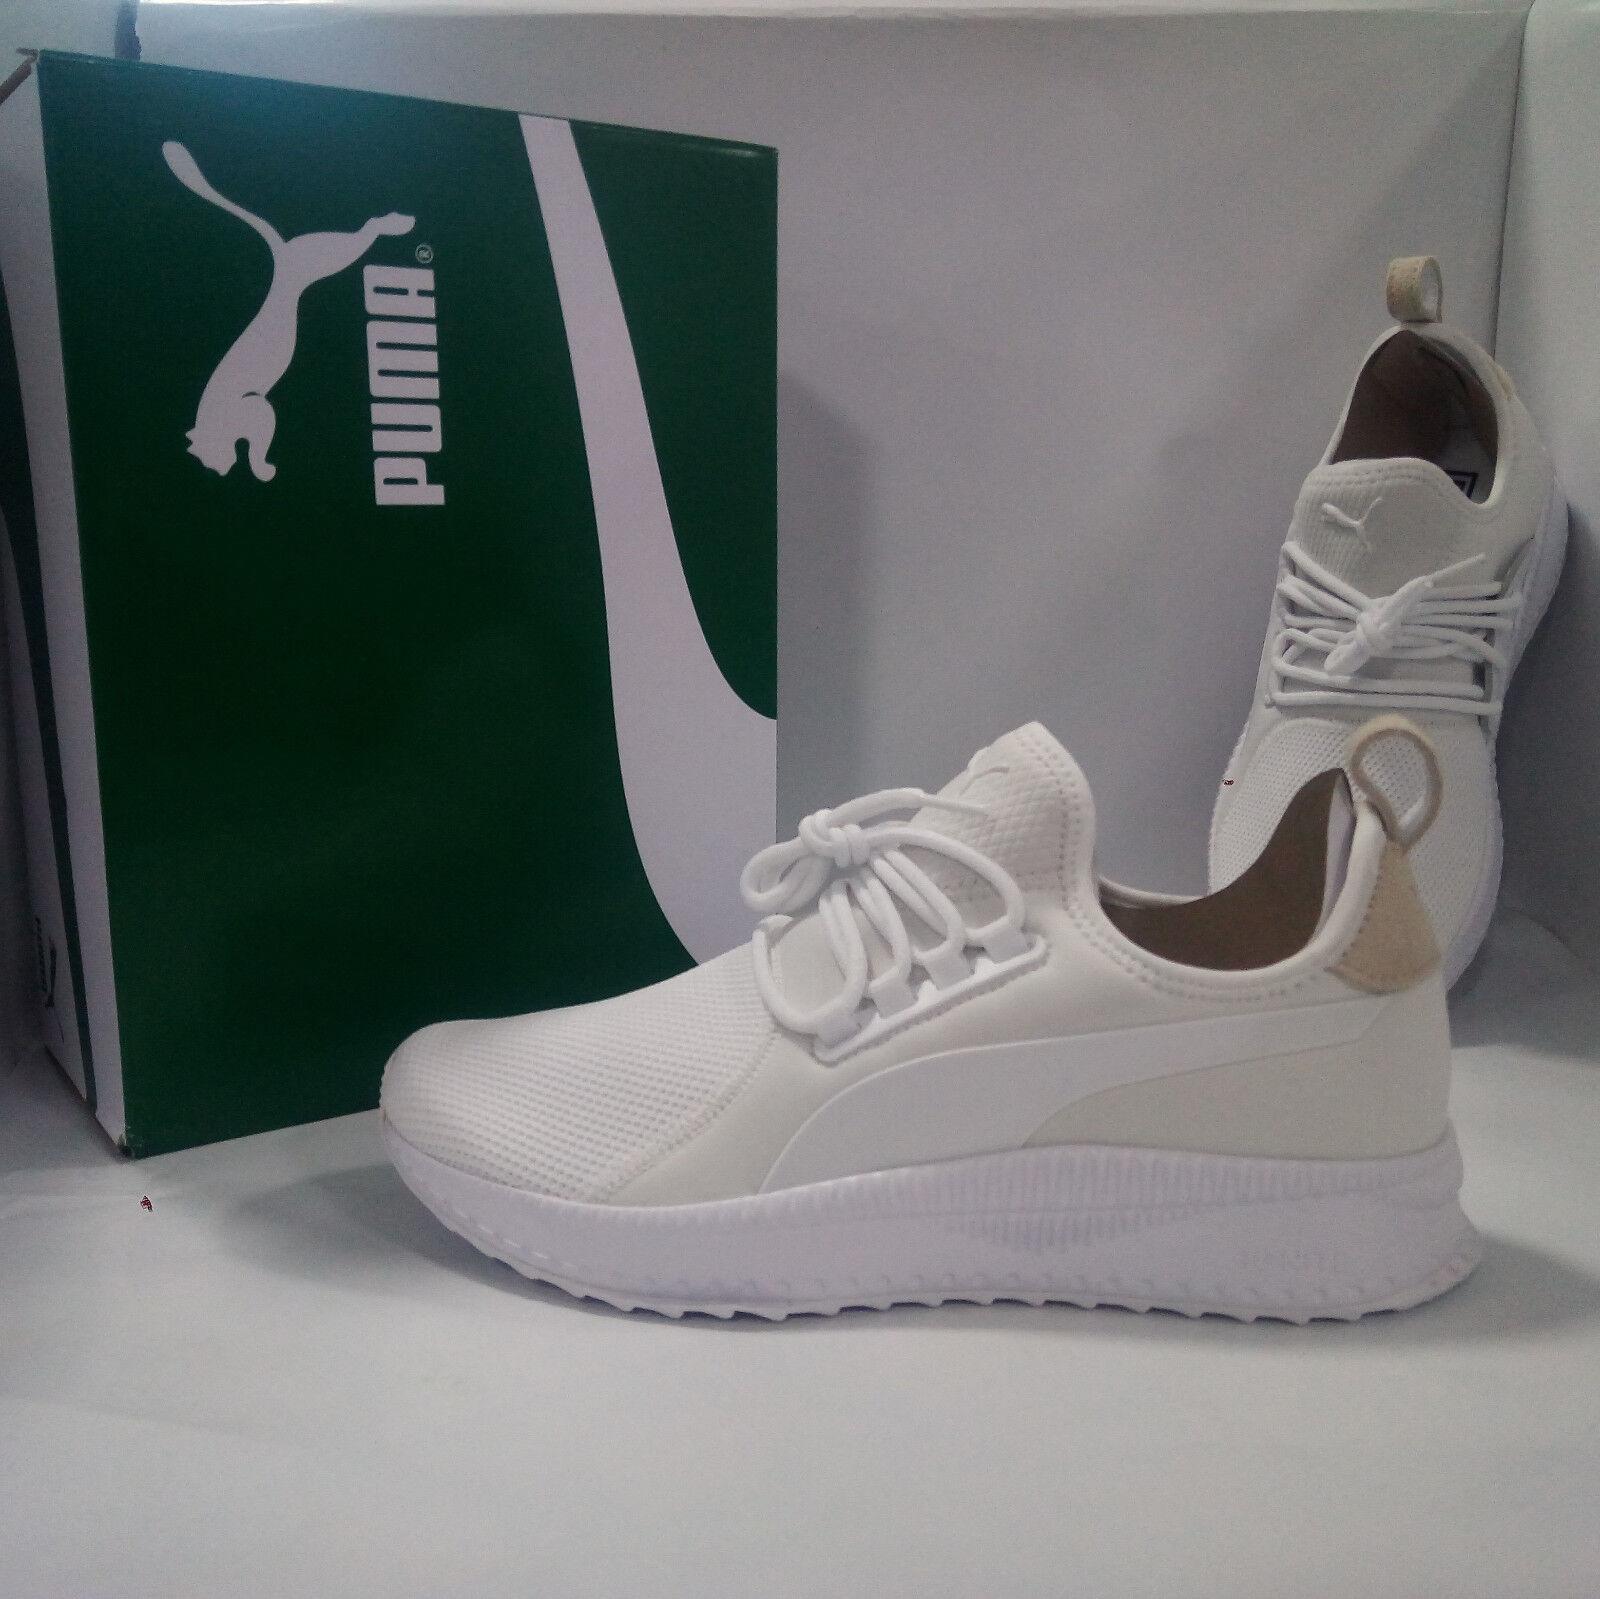 zapatos PUMA hombres - Tsugi Apex - Bianco - 366090